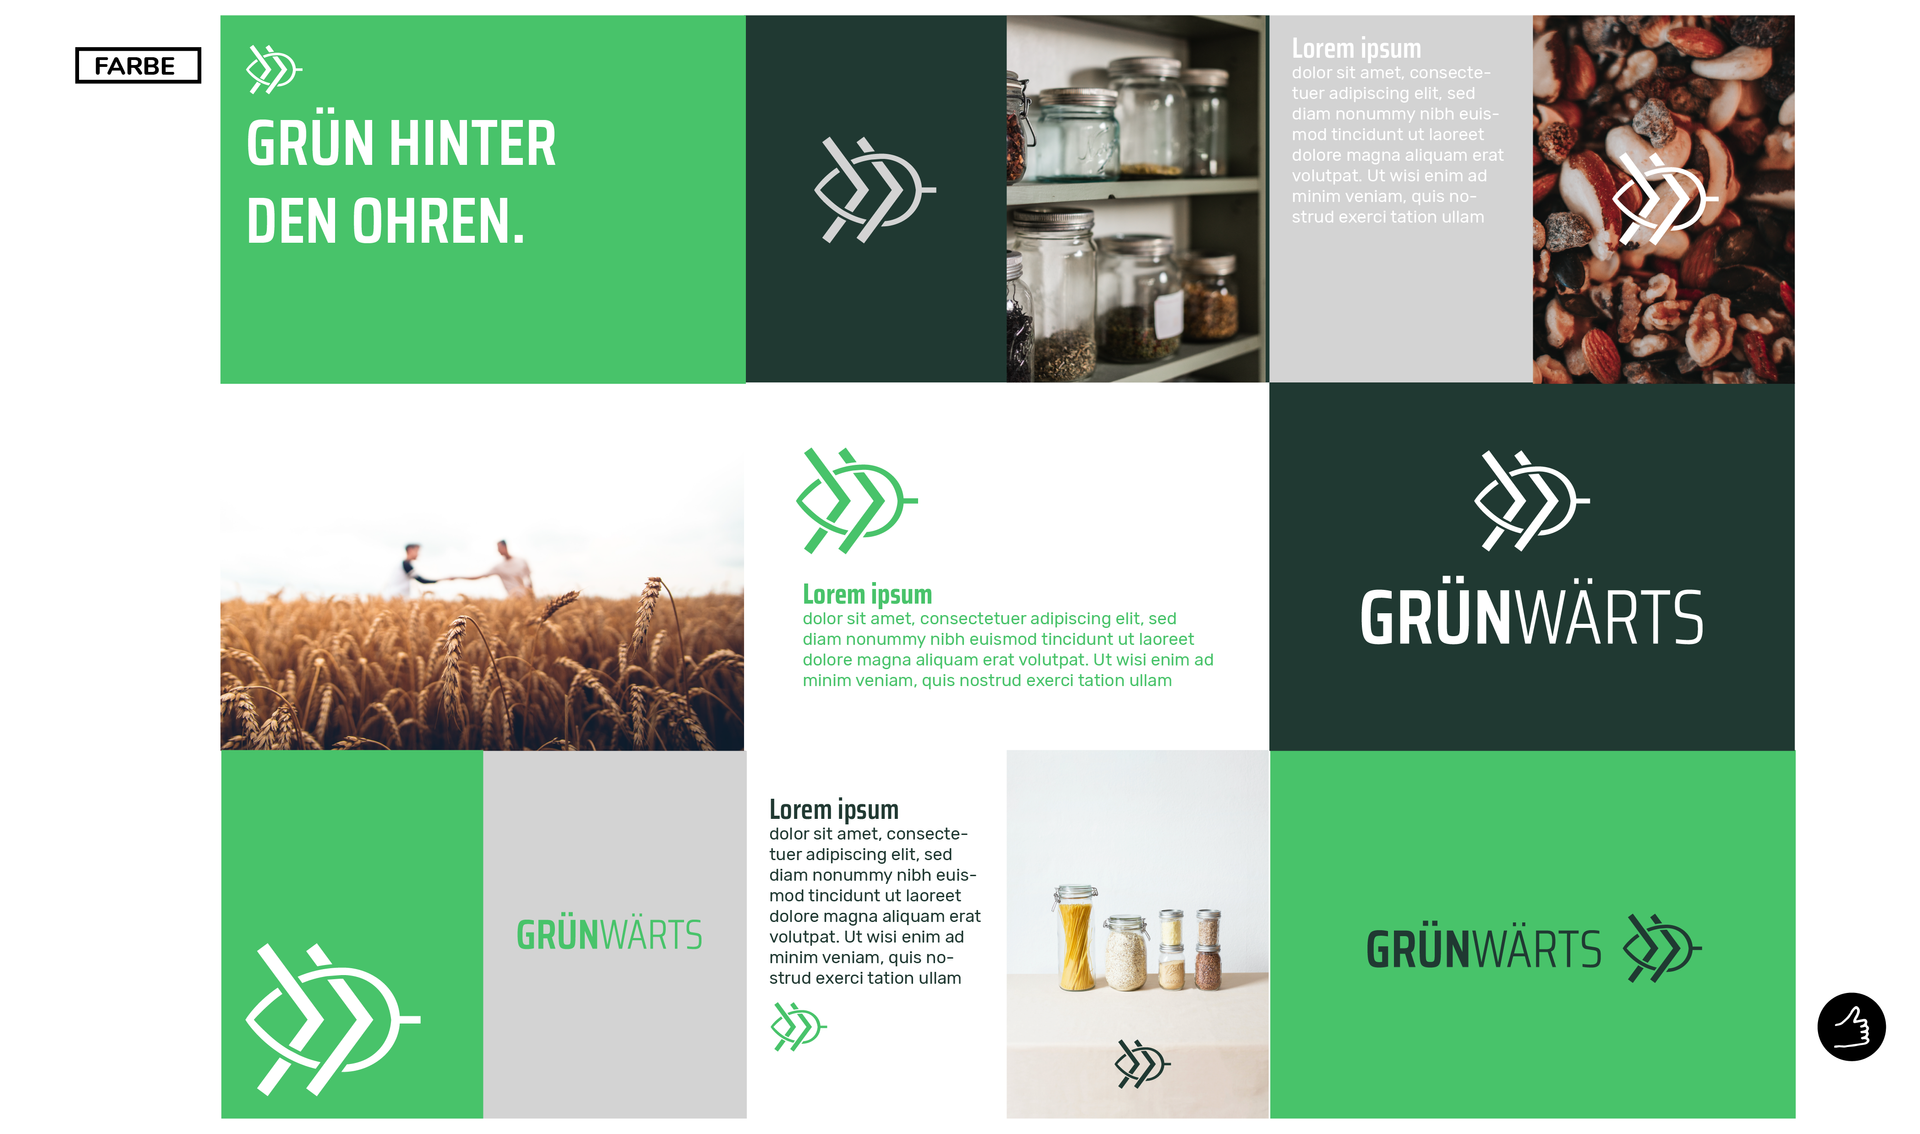 gruenwaerts(2)-Farbe1.png